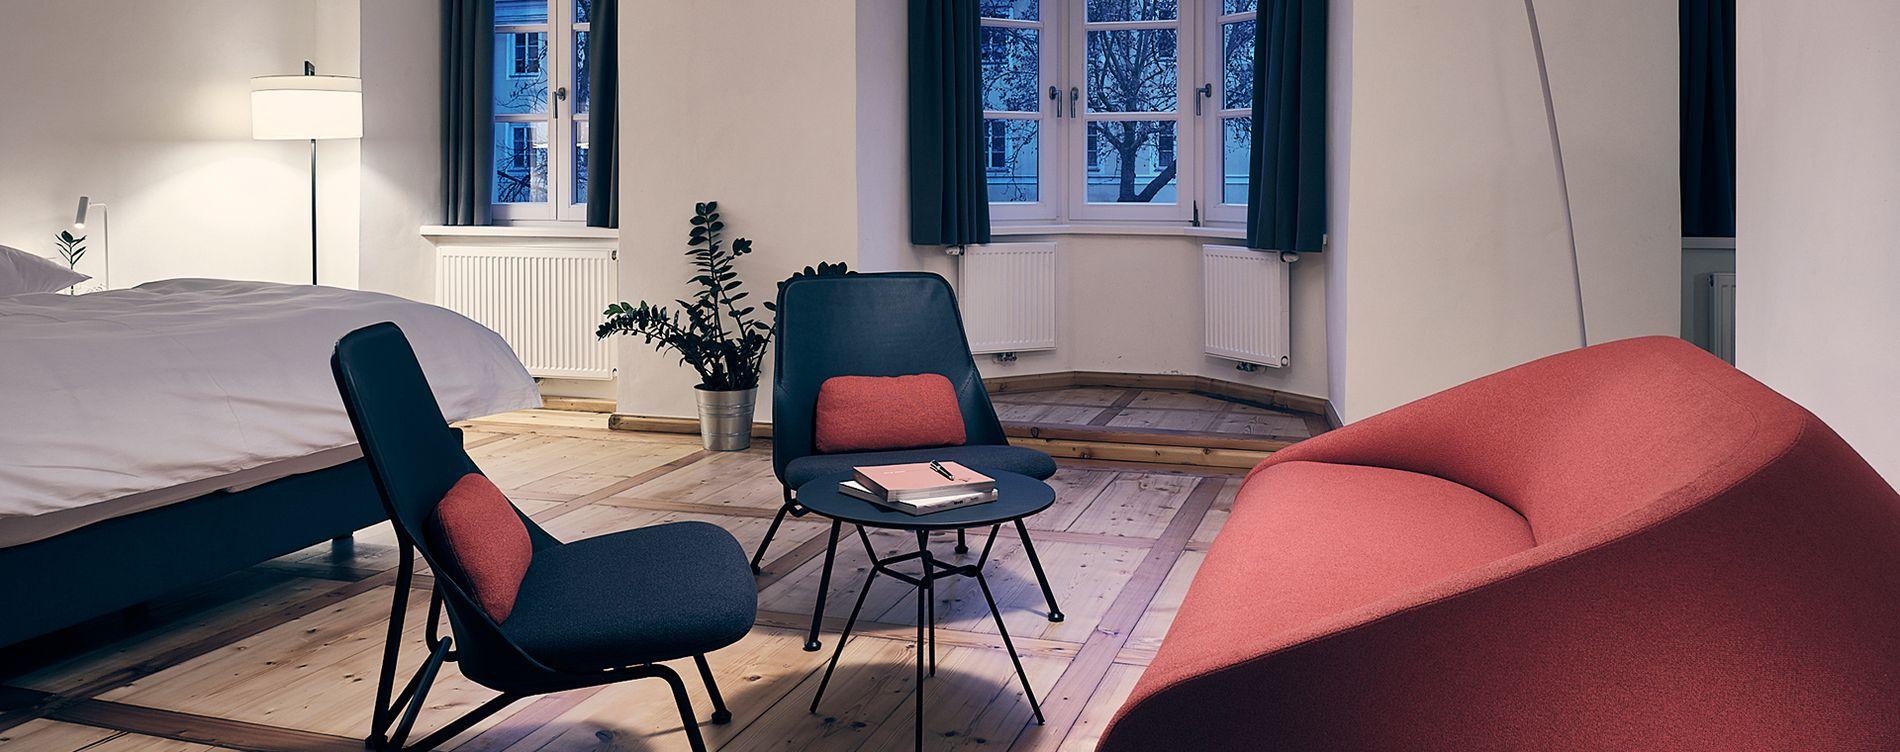 Kontor boutiquehotel in hall in tirol for Tirol designhotel